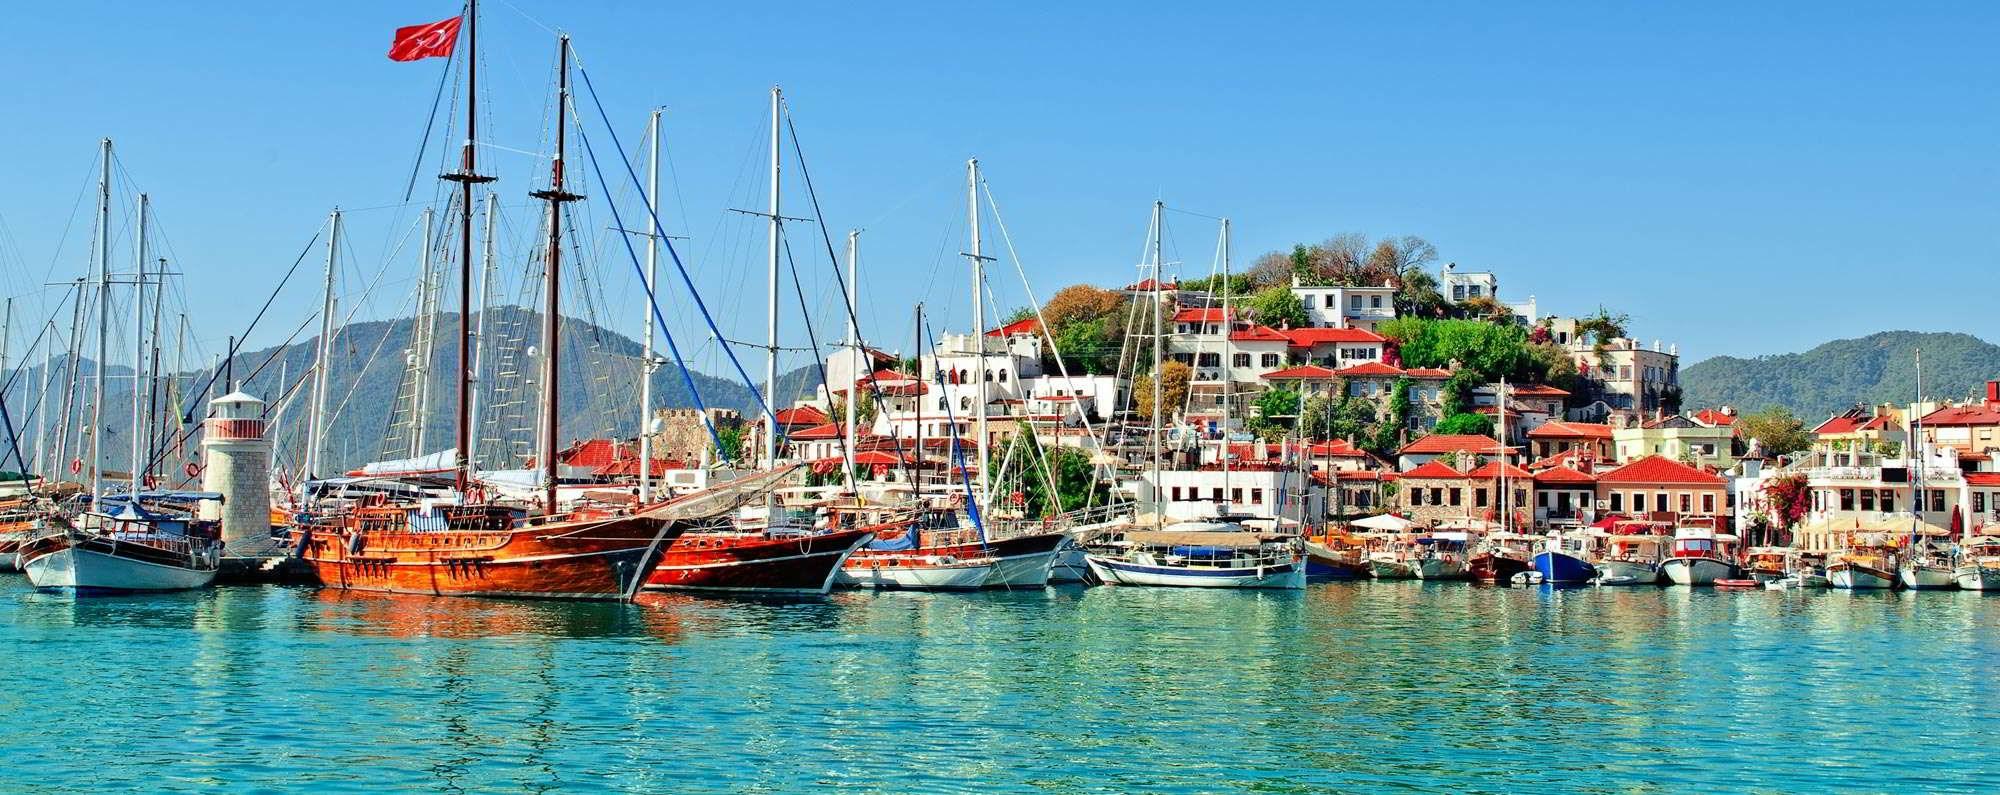 Yacht charter in Marmaris